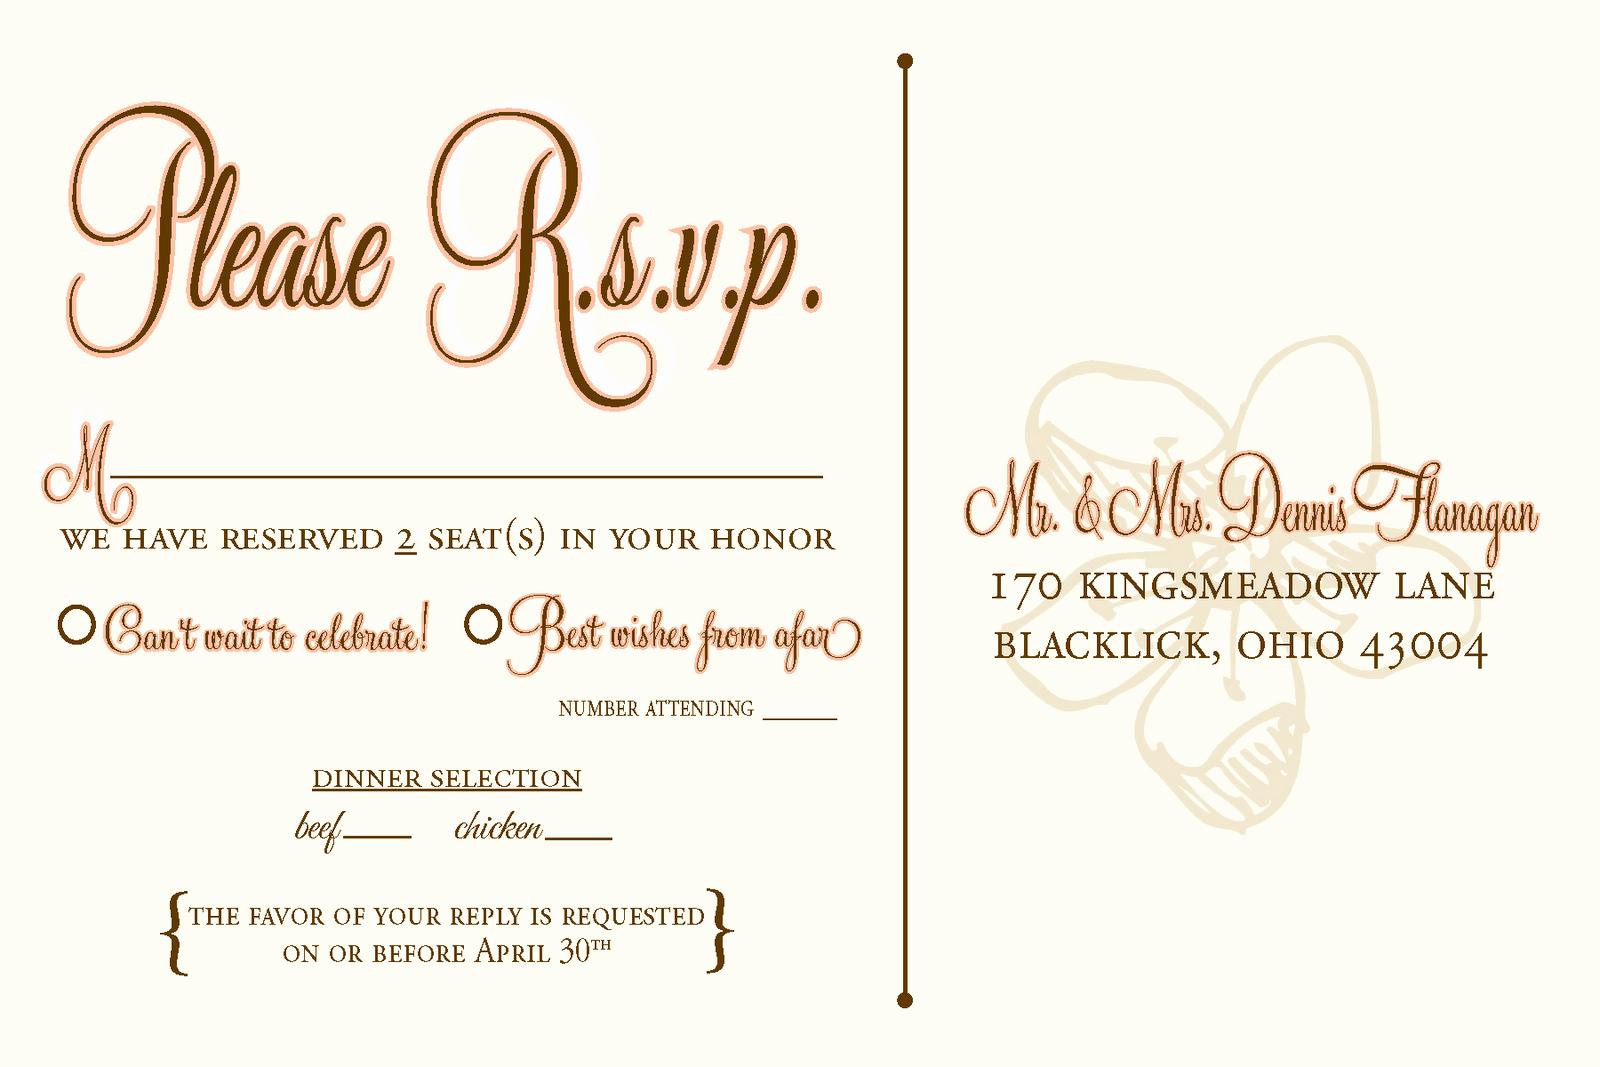 Rsvp Wedding Invitation Wording Lovely Wedding Rsvp Wording Google Search